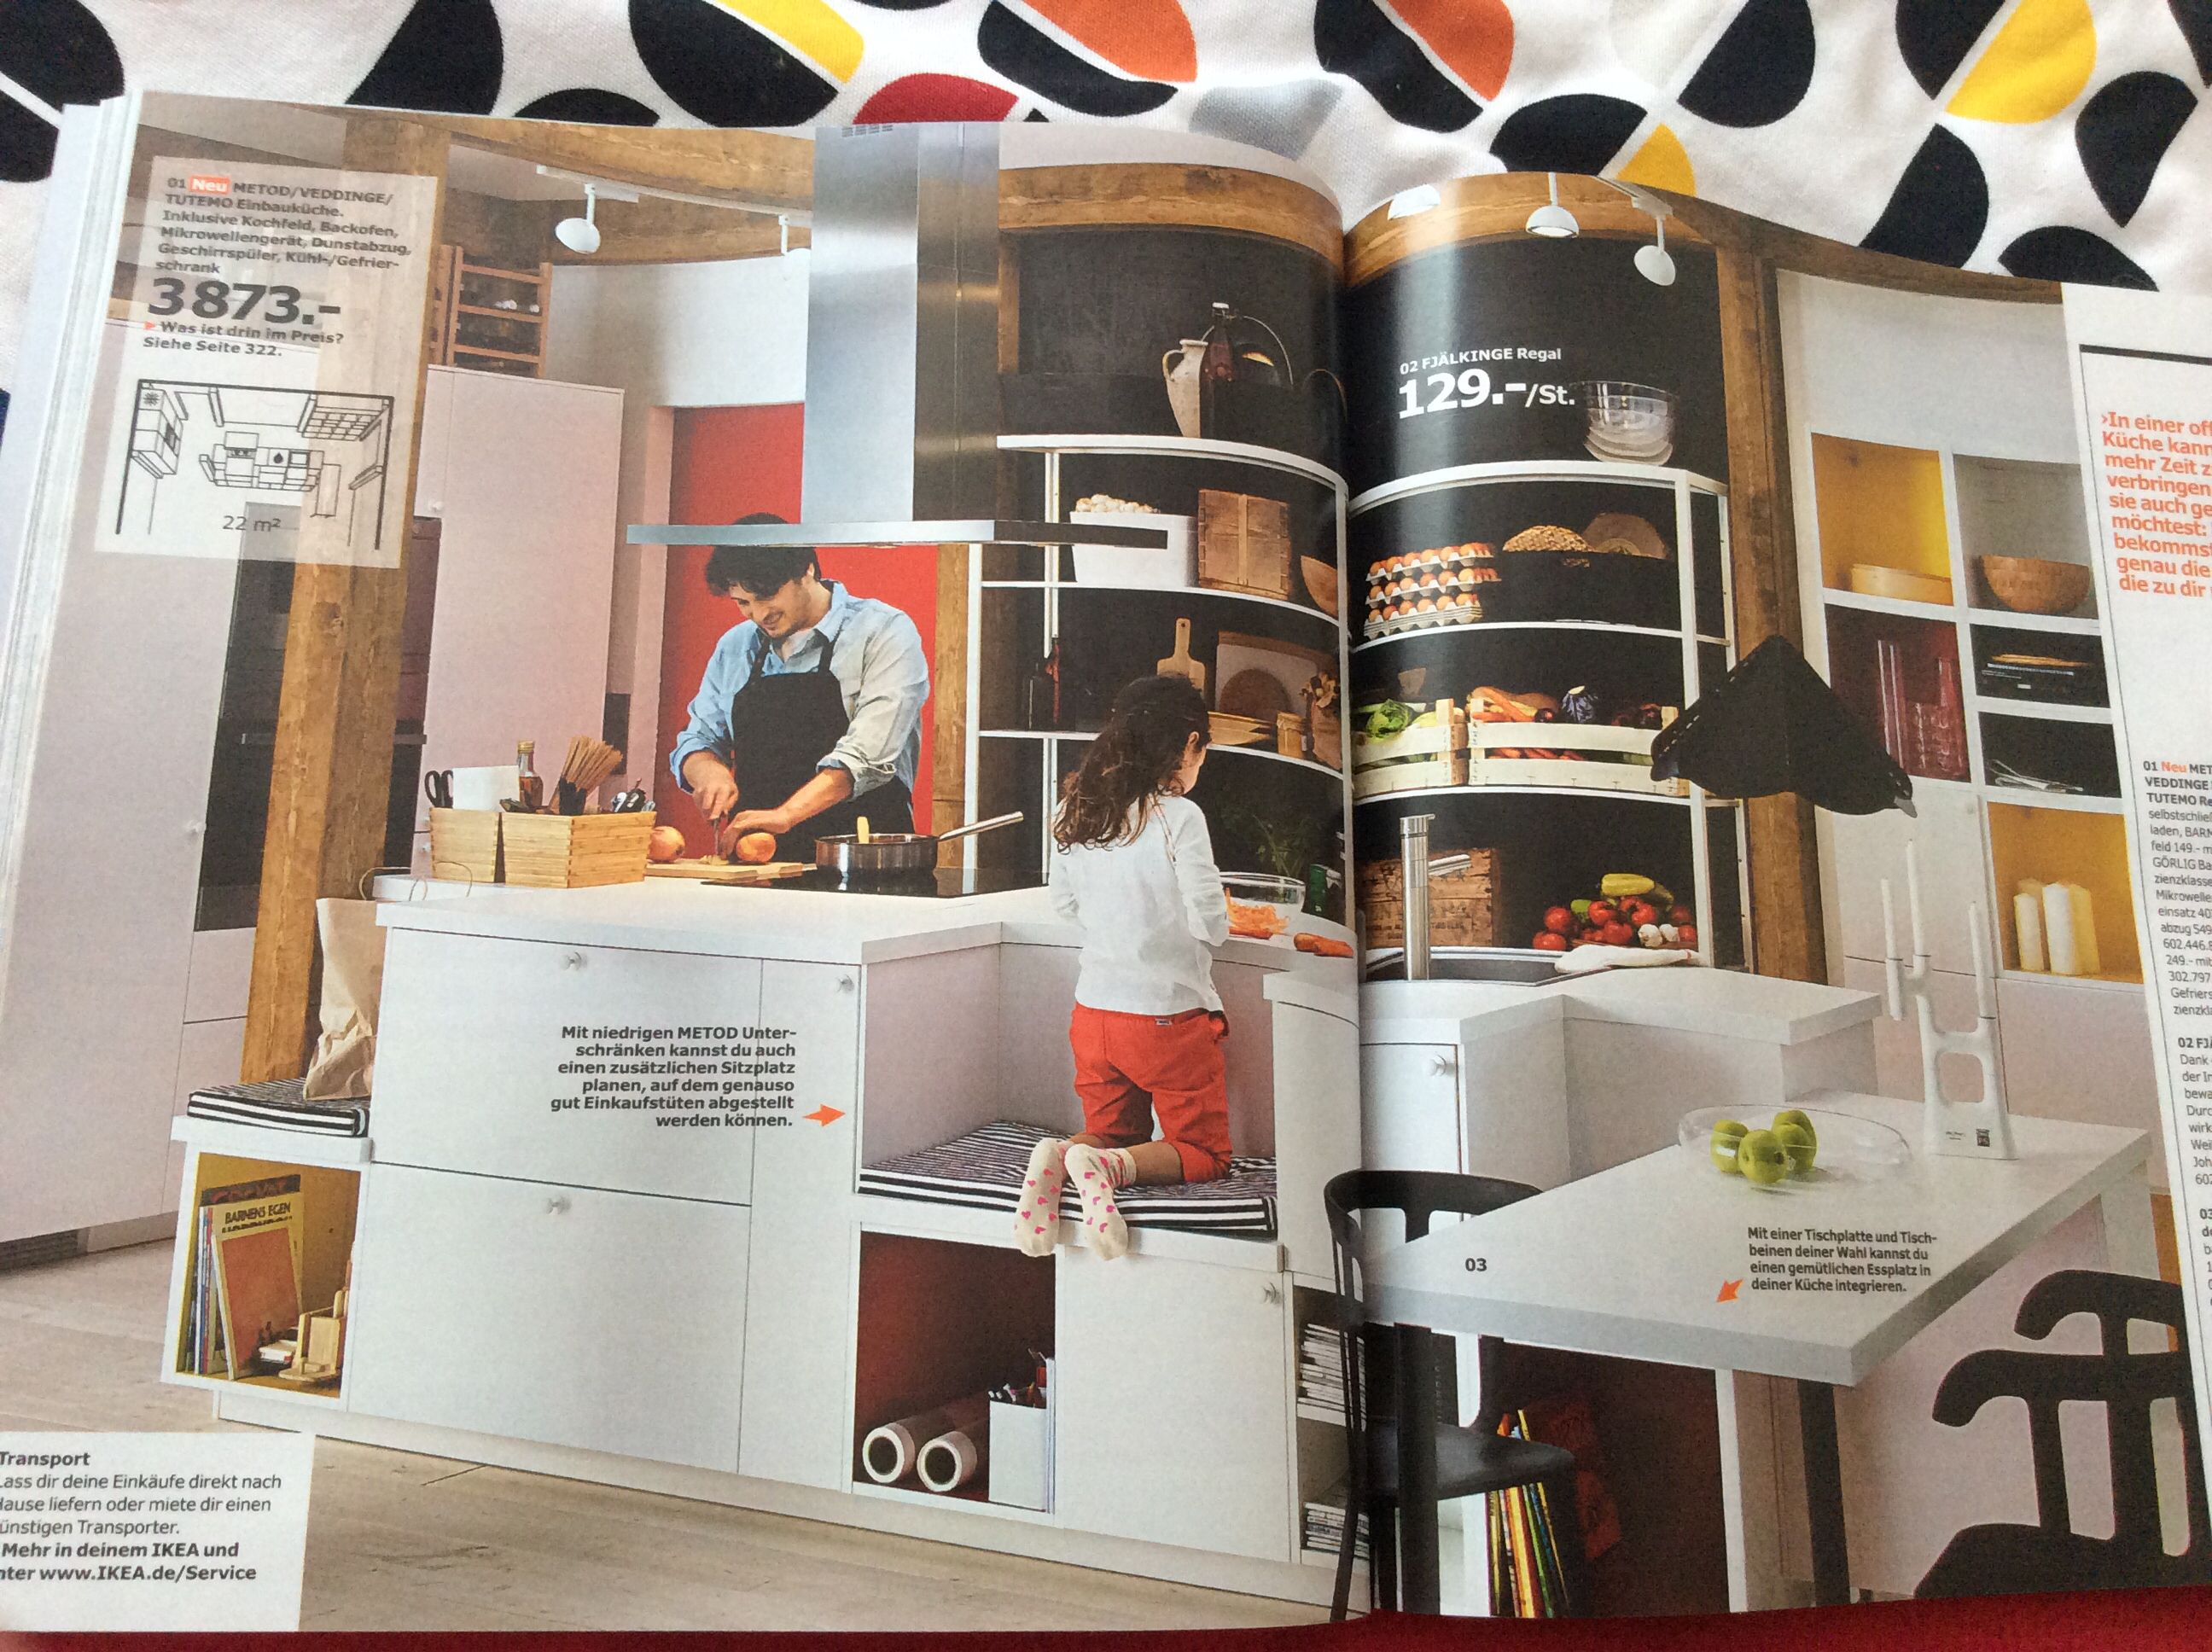 Kuche Ikea Regal Kochinsel In Kleine Kuche Modern Offen Ikea Faktum